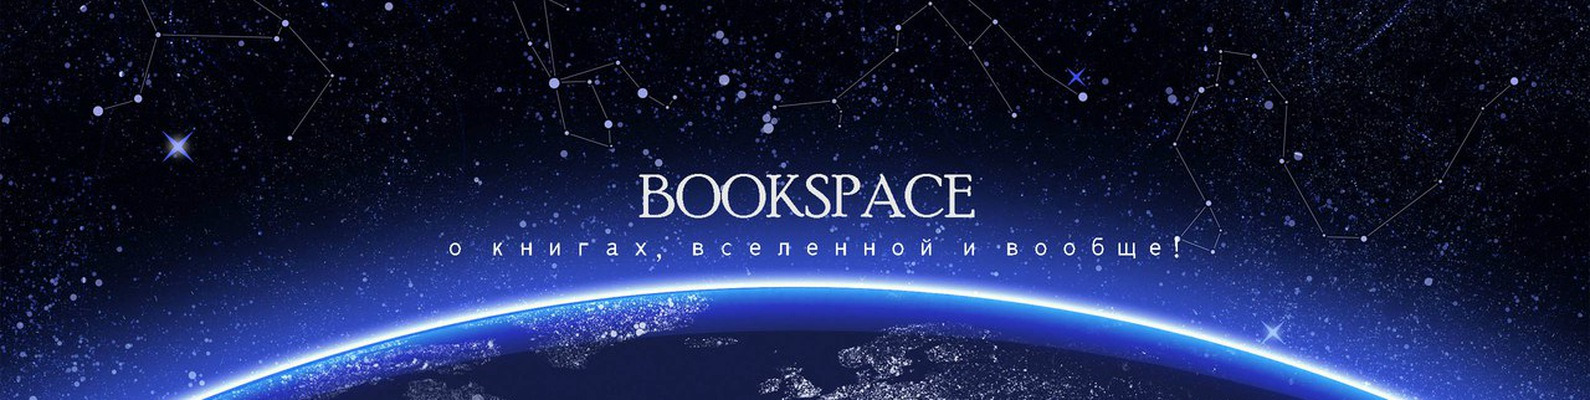 Сериал bookspace